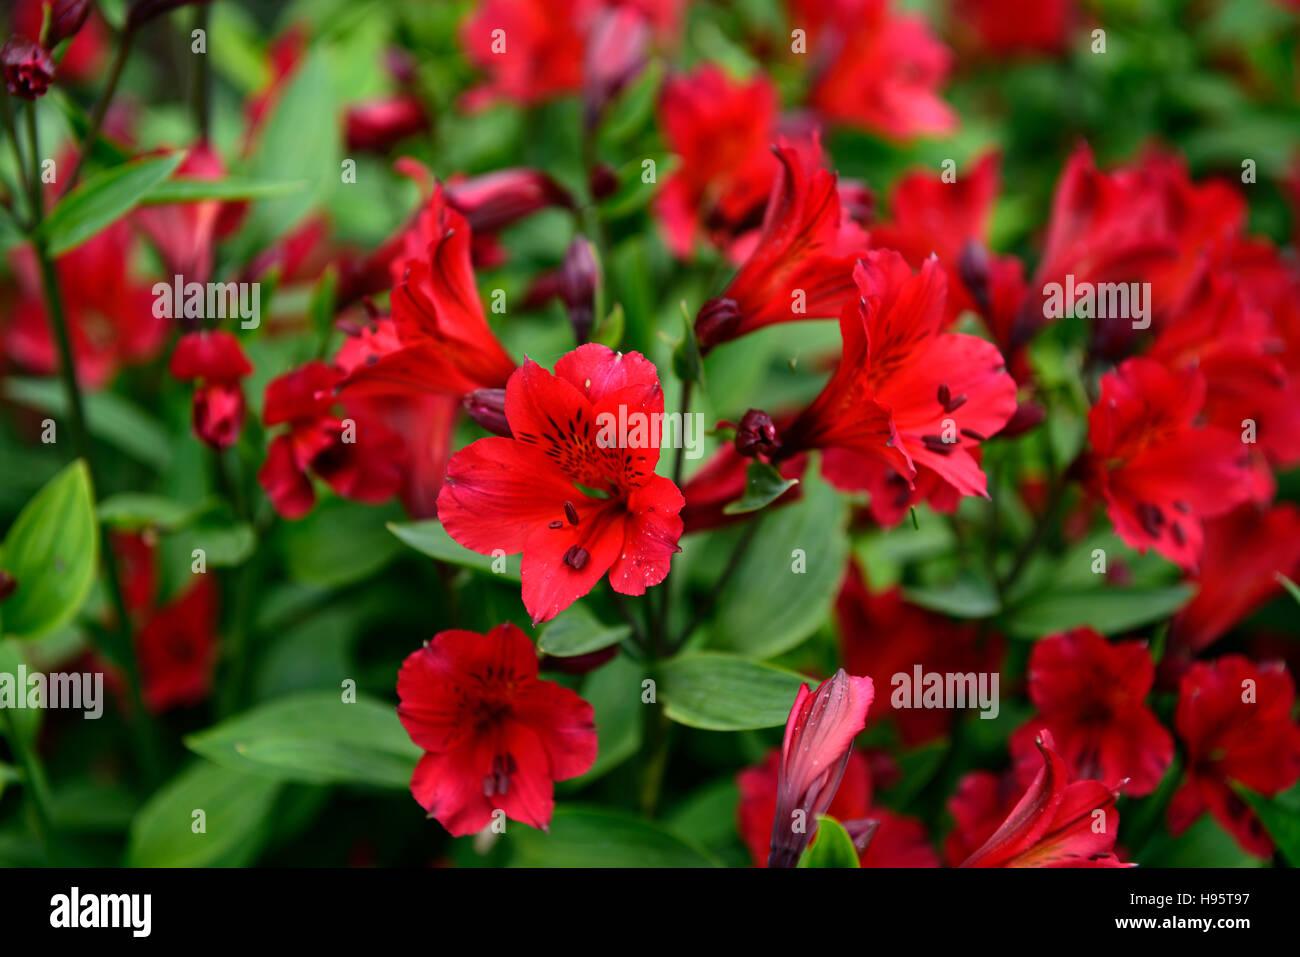 Alstroemeria Red Elf Alstroemerias Peruvian Lilies Lily Red Flowers